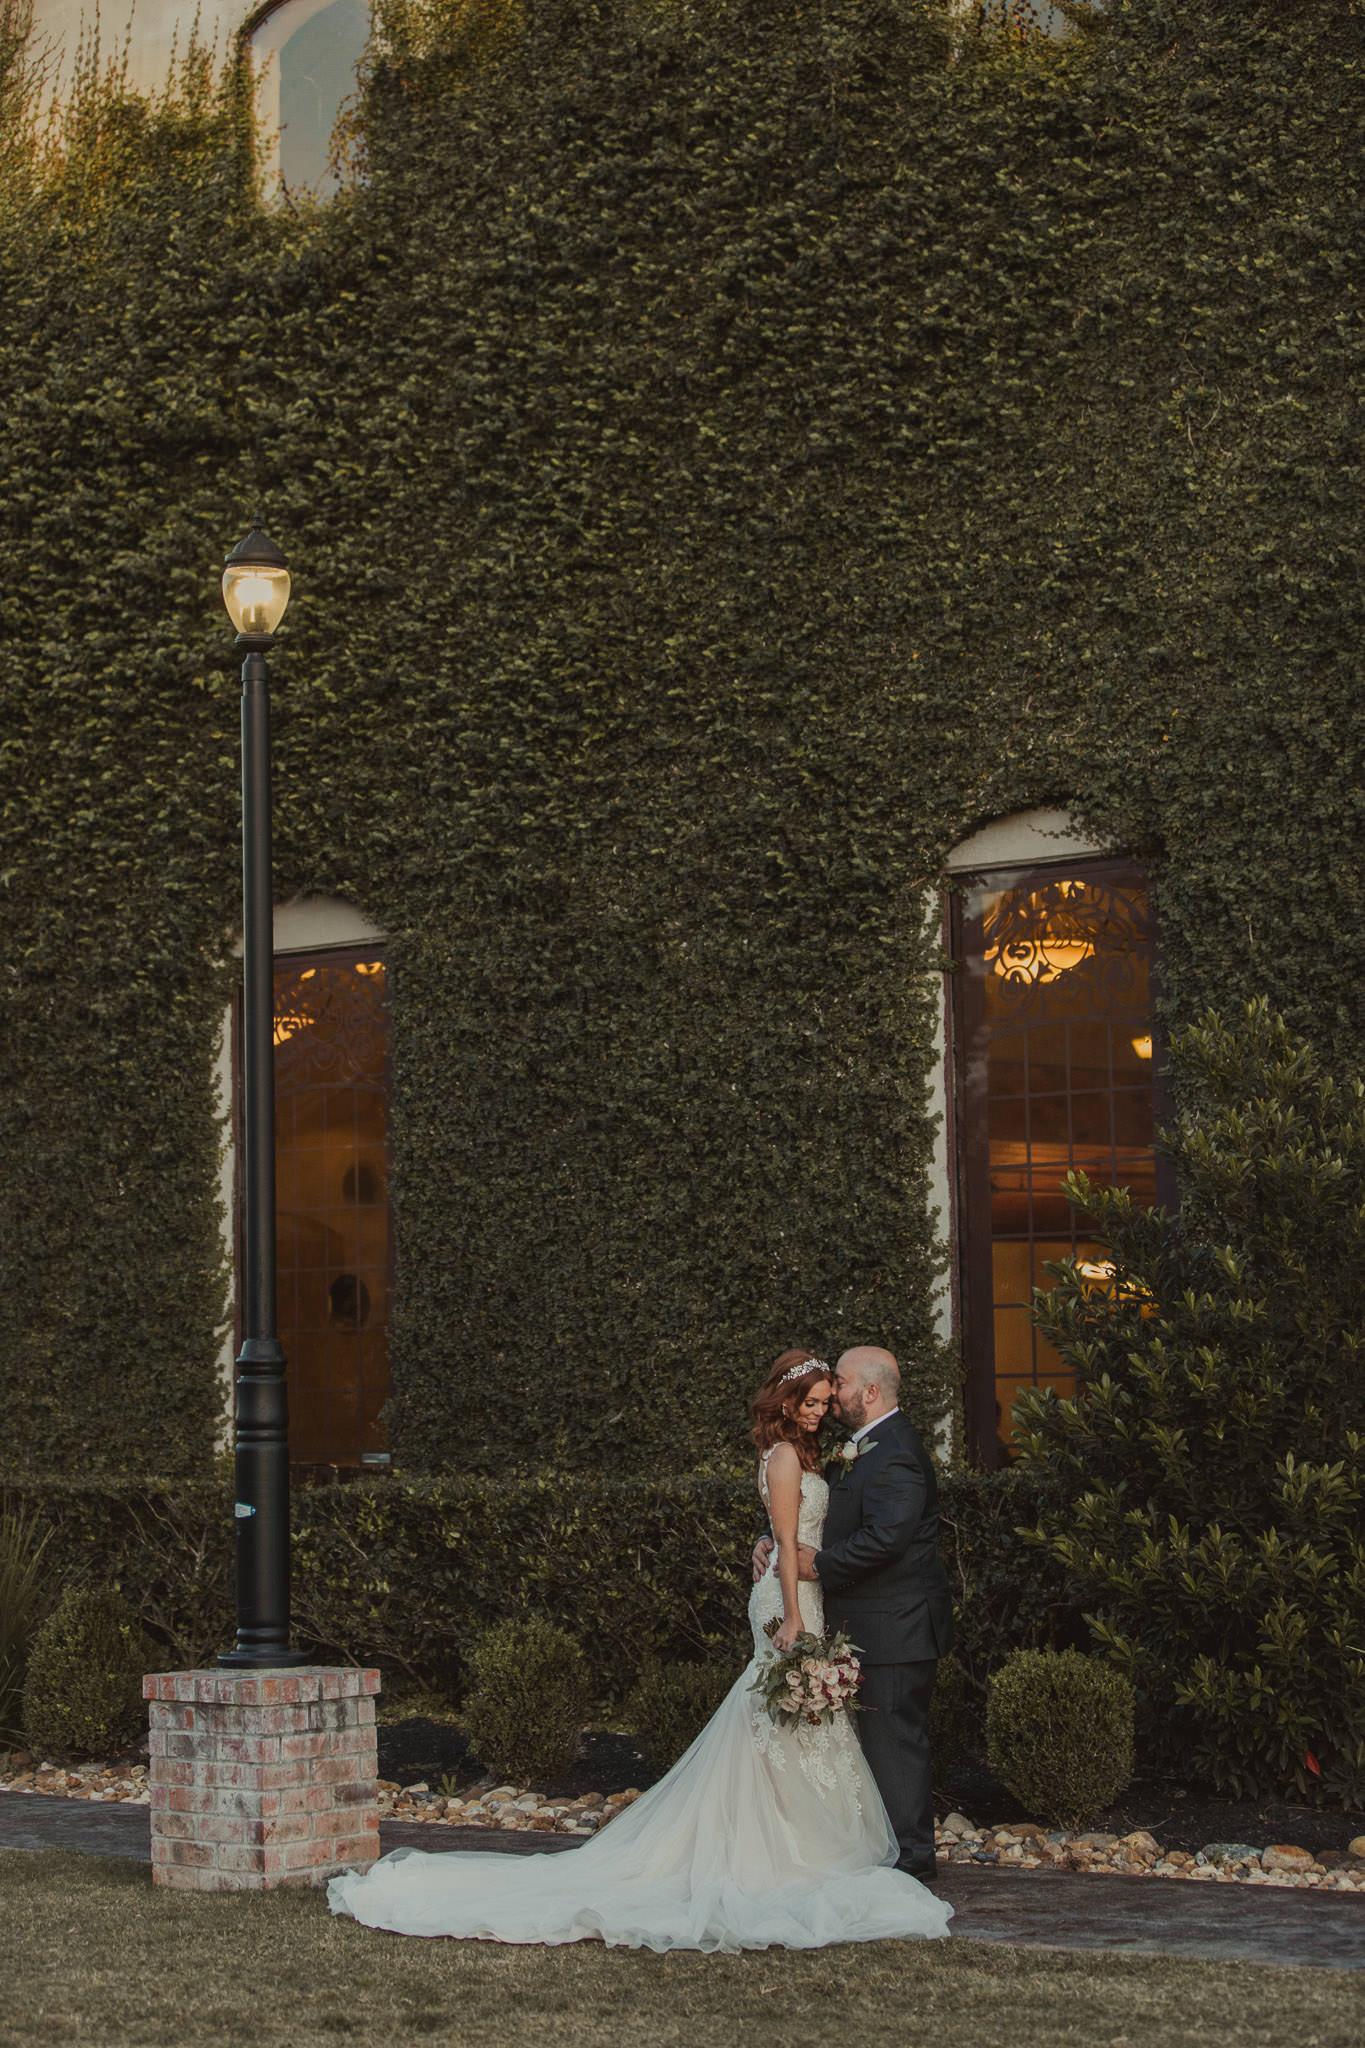 Cynthia-Curtis-Olde-Dobbine-Station-Houston-Wedding-Photographer-sm-75.jpg